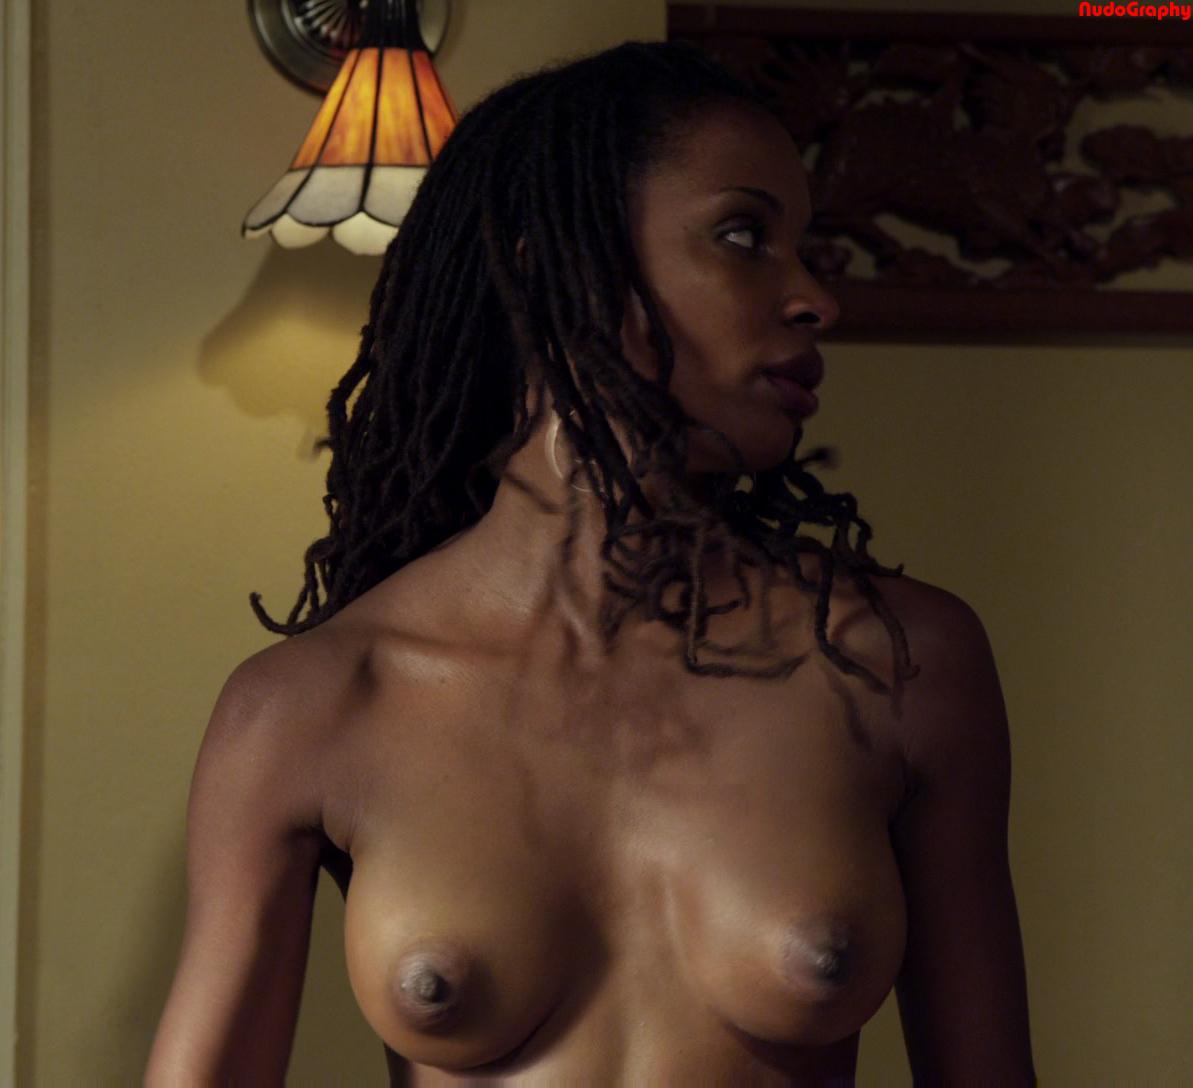 merrin dungey nude photos